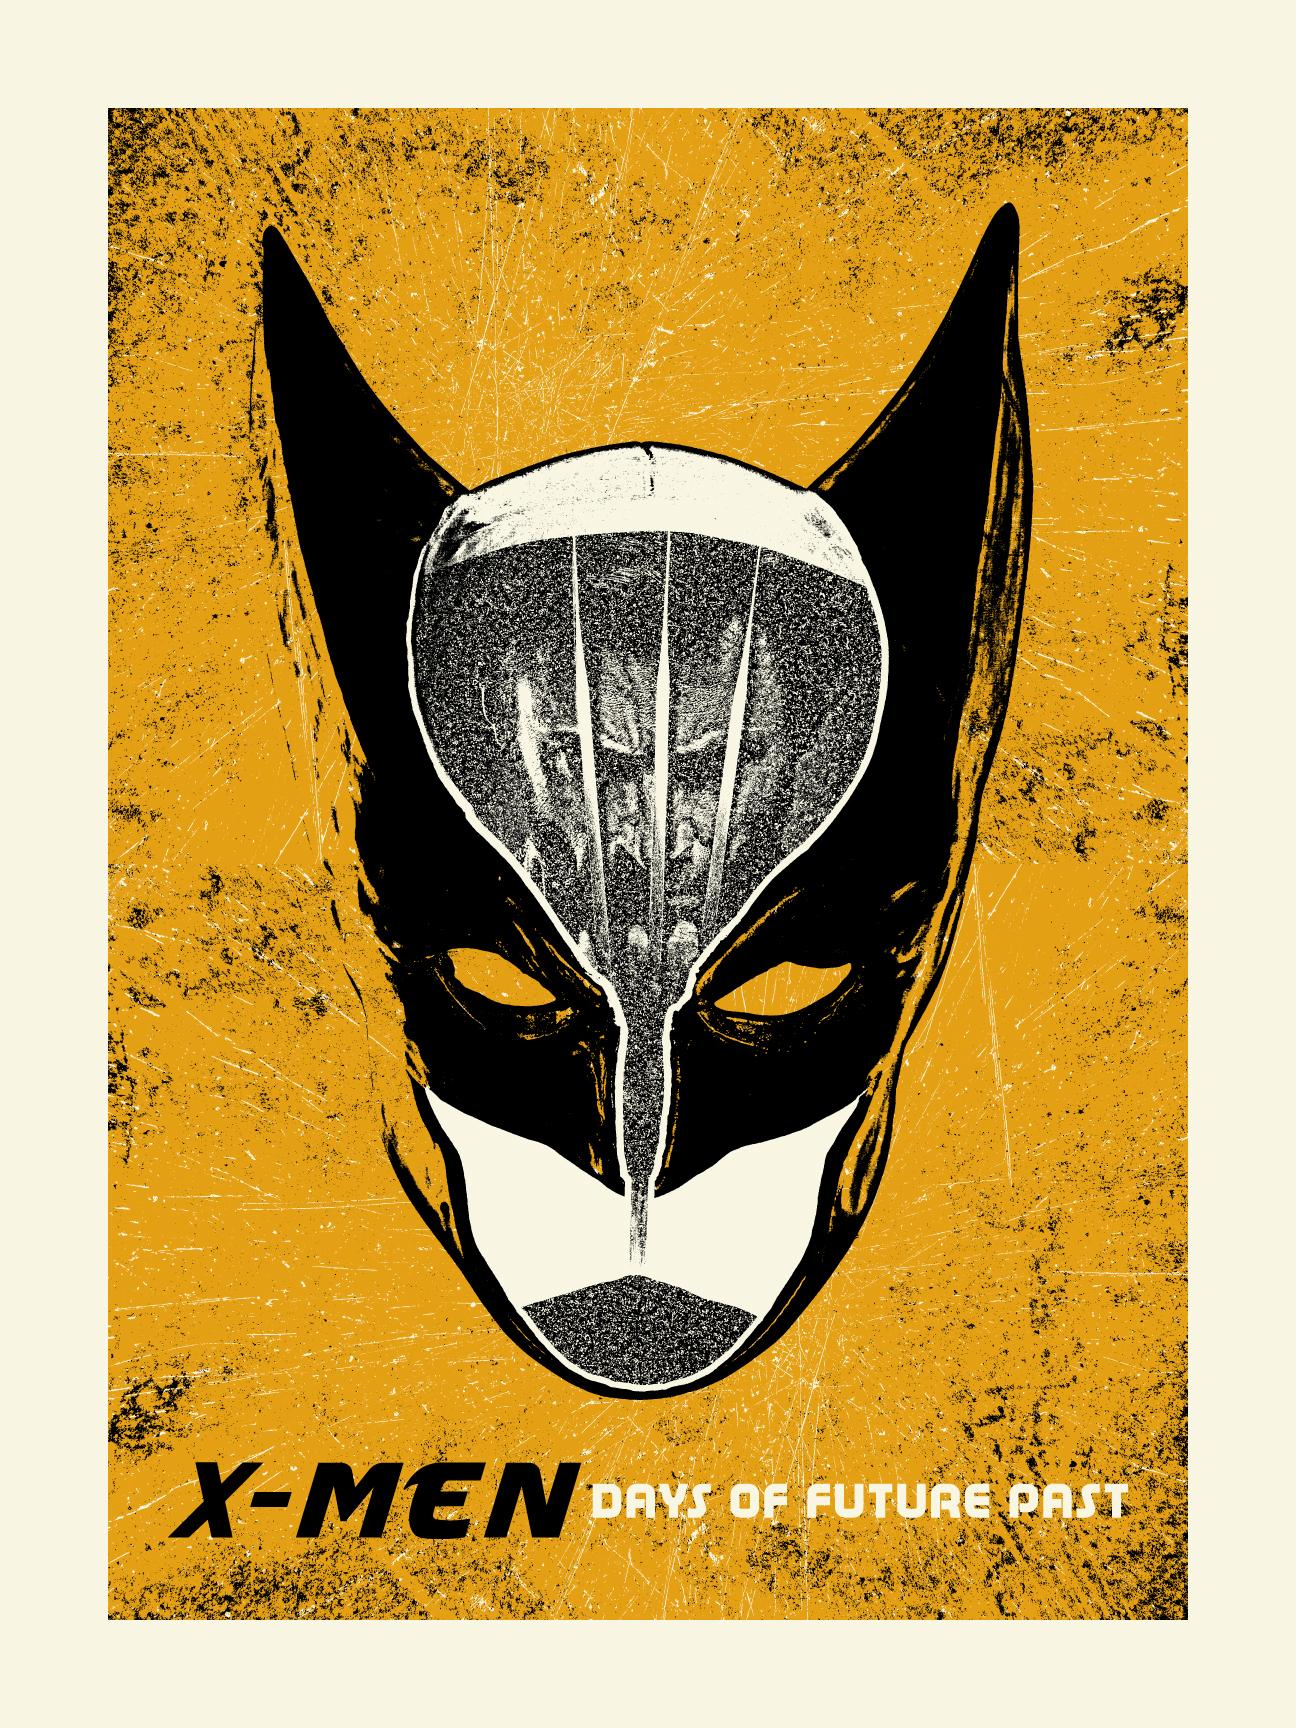 x-men days of future past by Chris Garofalo